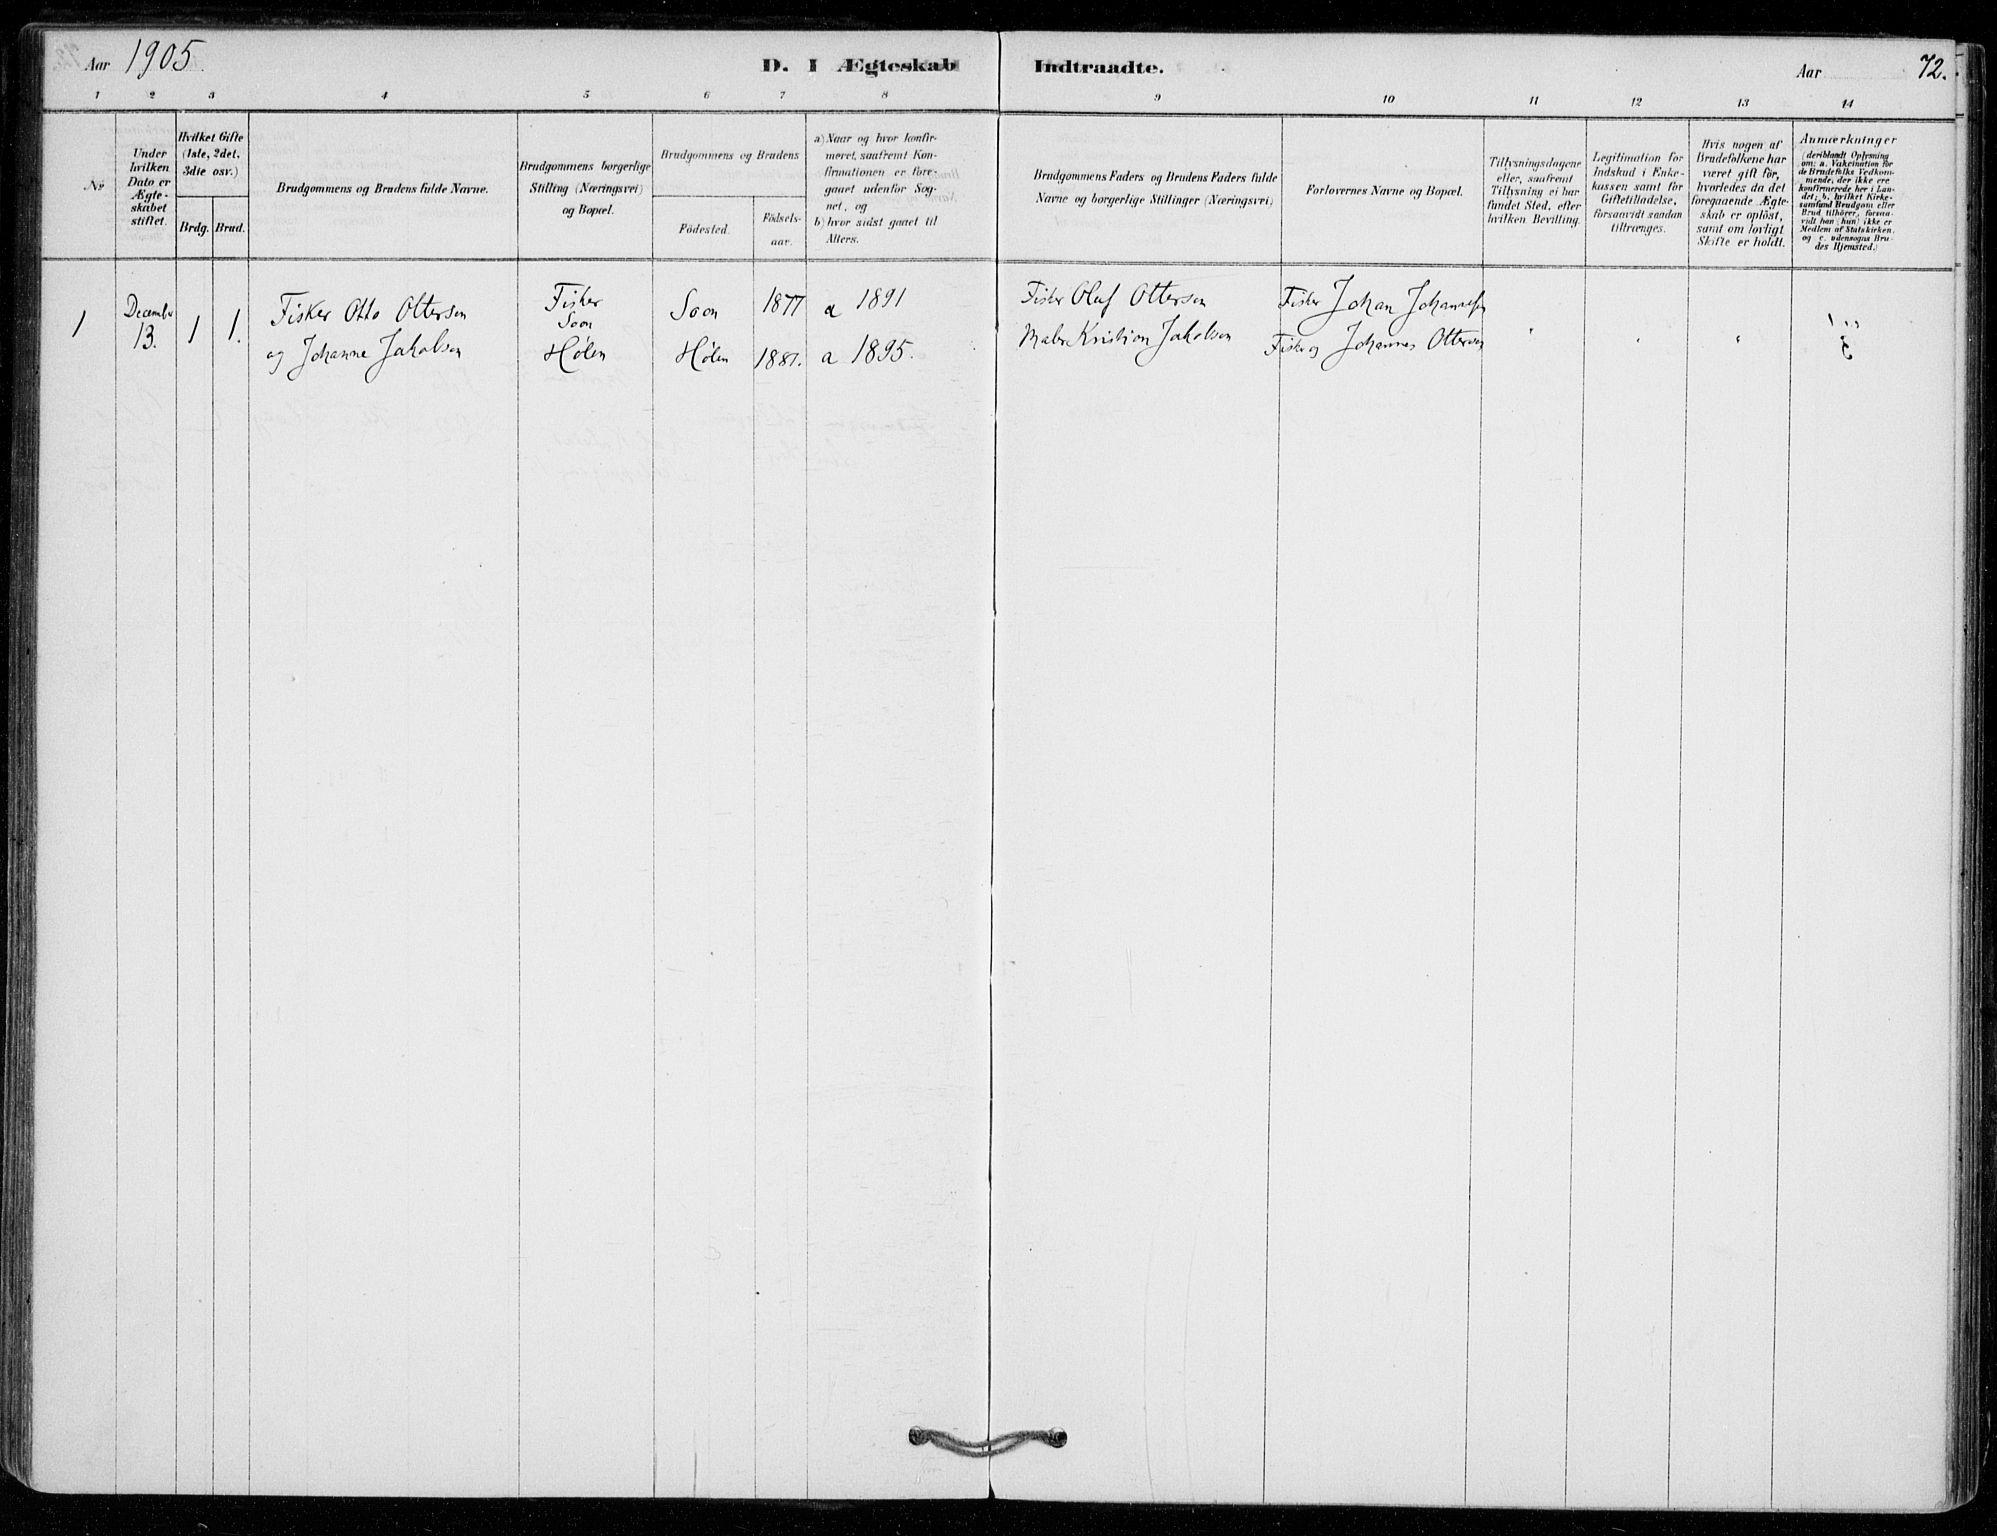 SAO, Vestby prestekontor Kirkebøker, F/Fe/L0001: Ministerialbok nr. V 1, 1878-1931, s. 72